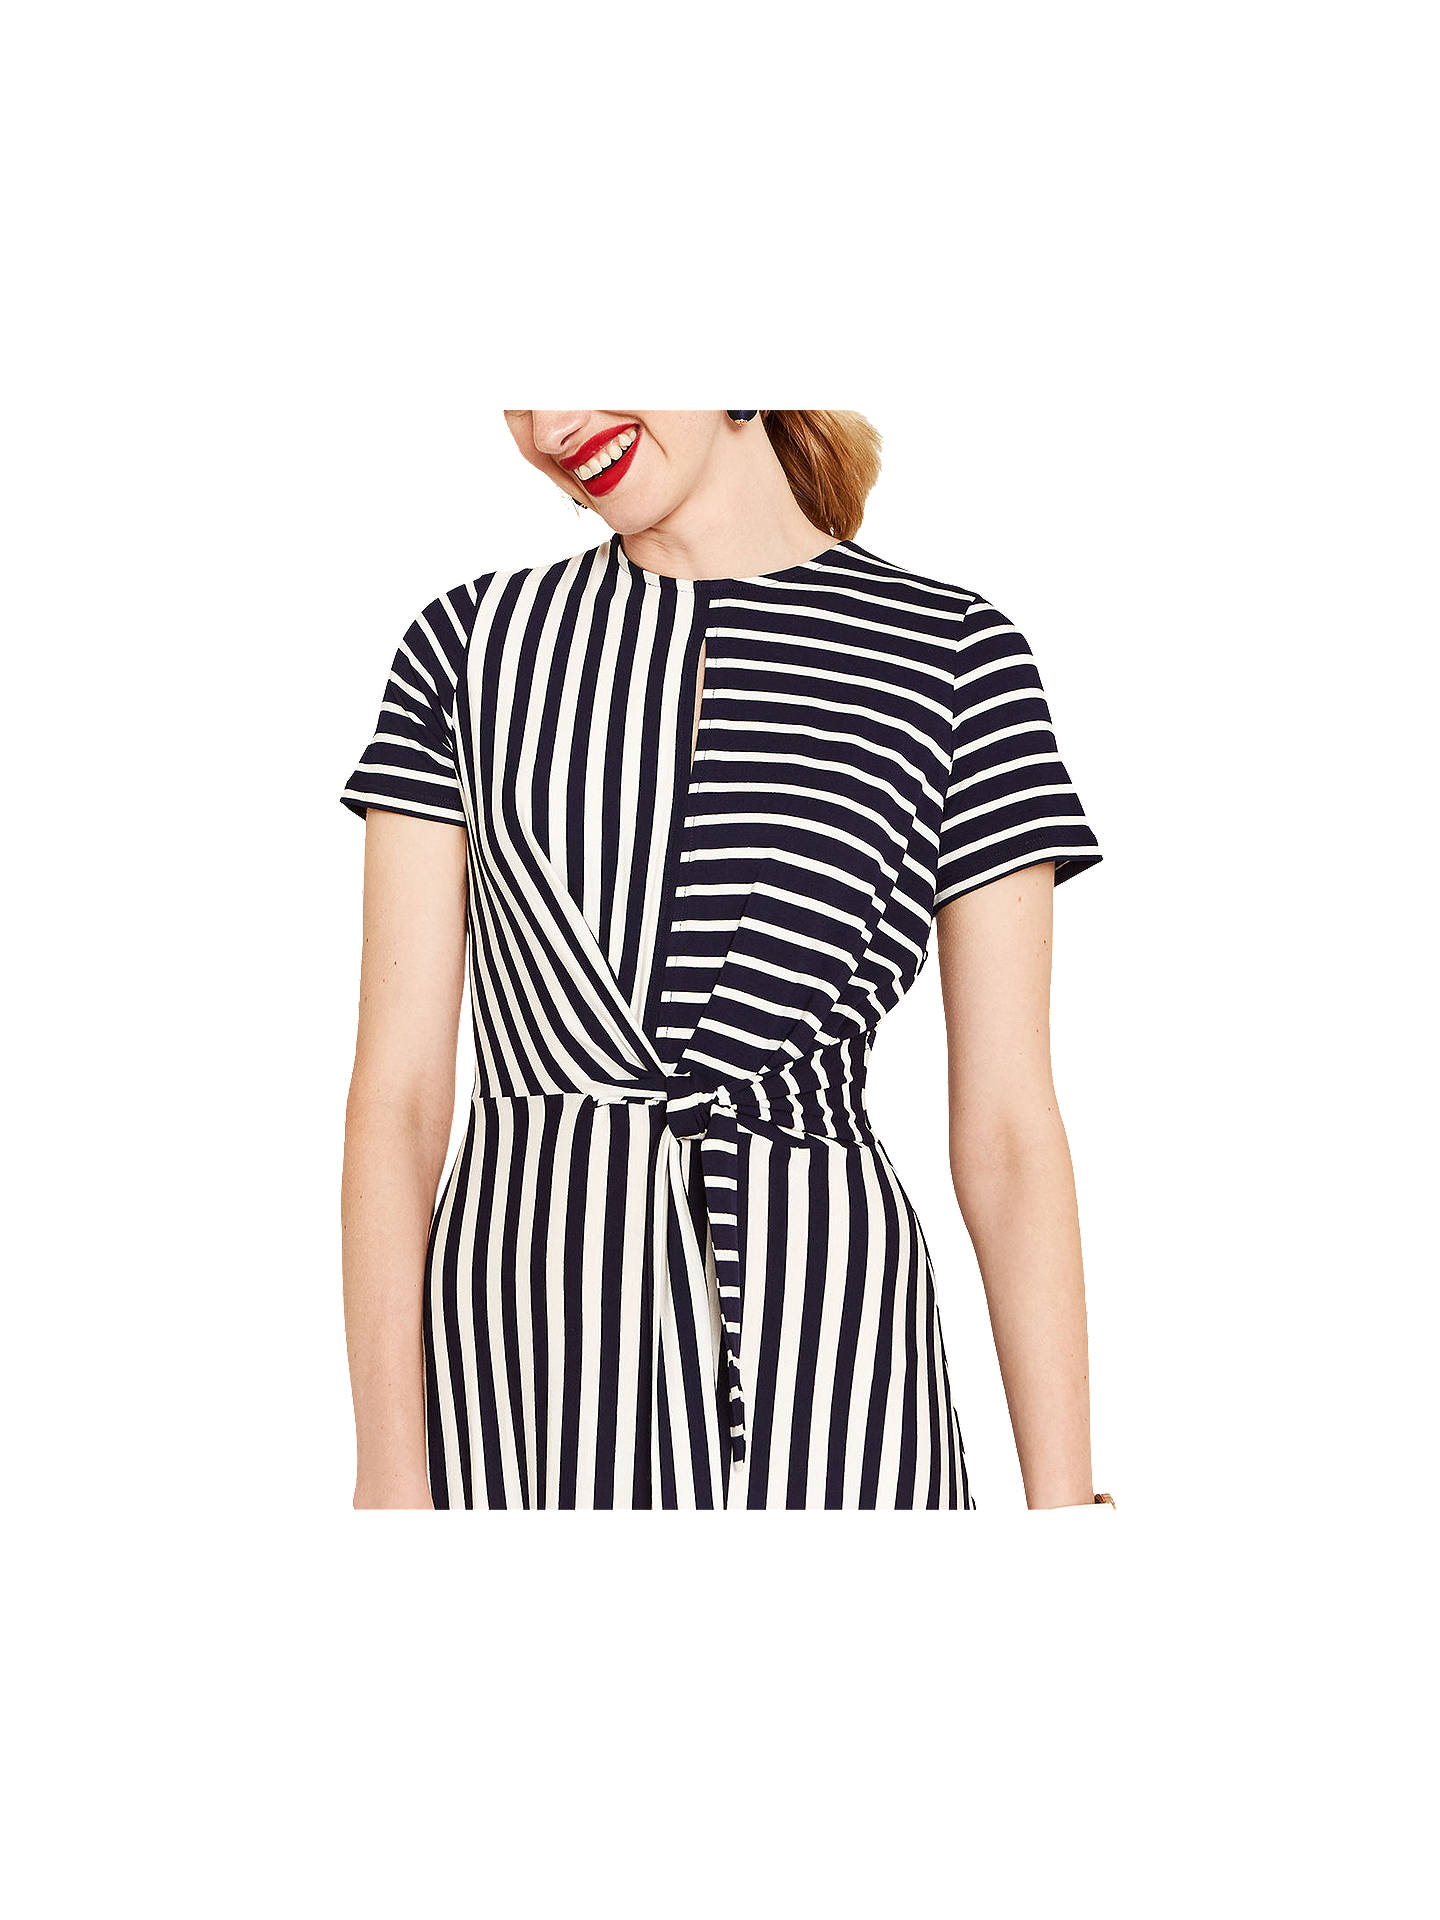 554cb55c67ac ... Buy Oasis Asymmetric Striped Dress, Blue/White, S Online at  johnlewis.com